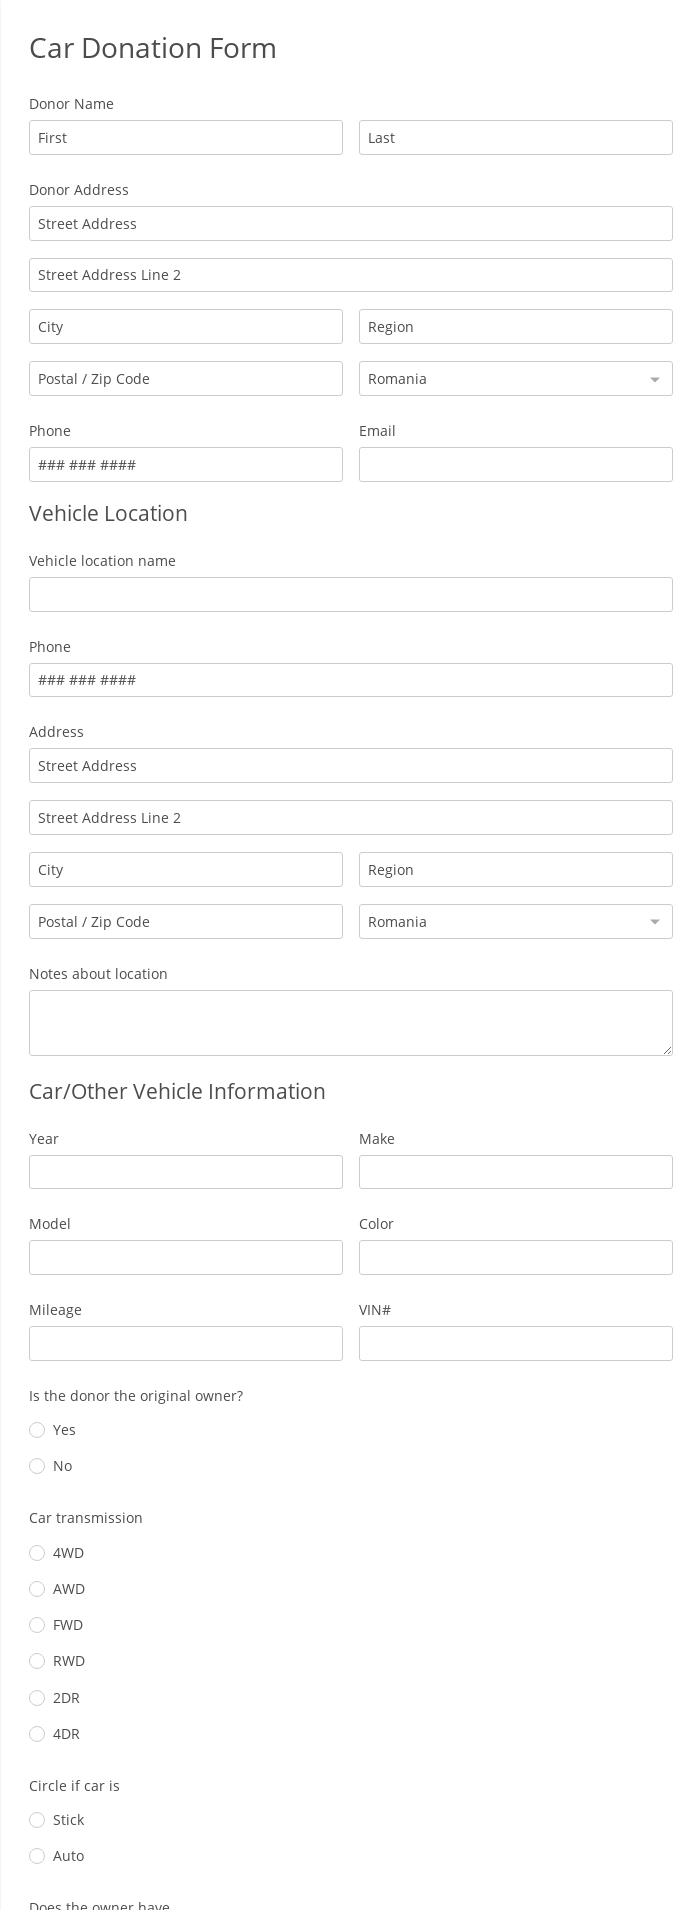 Car Donation Form